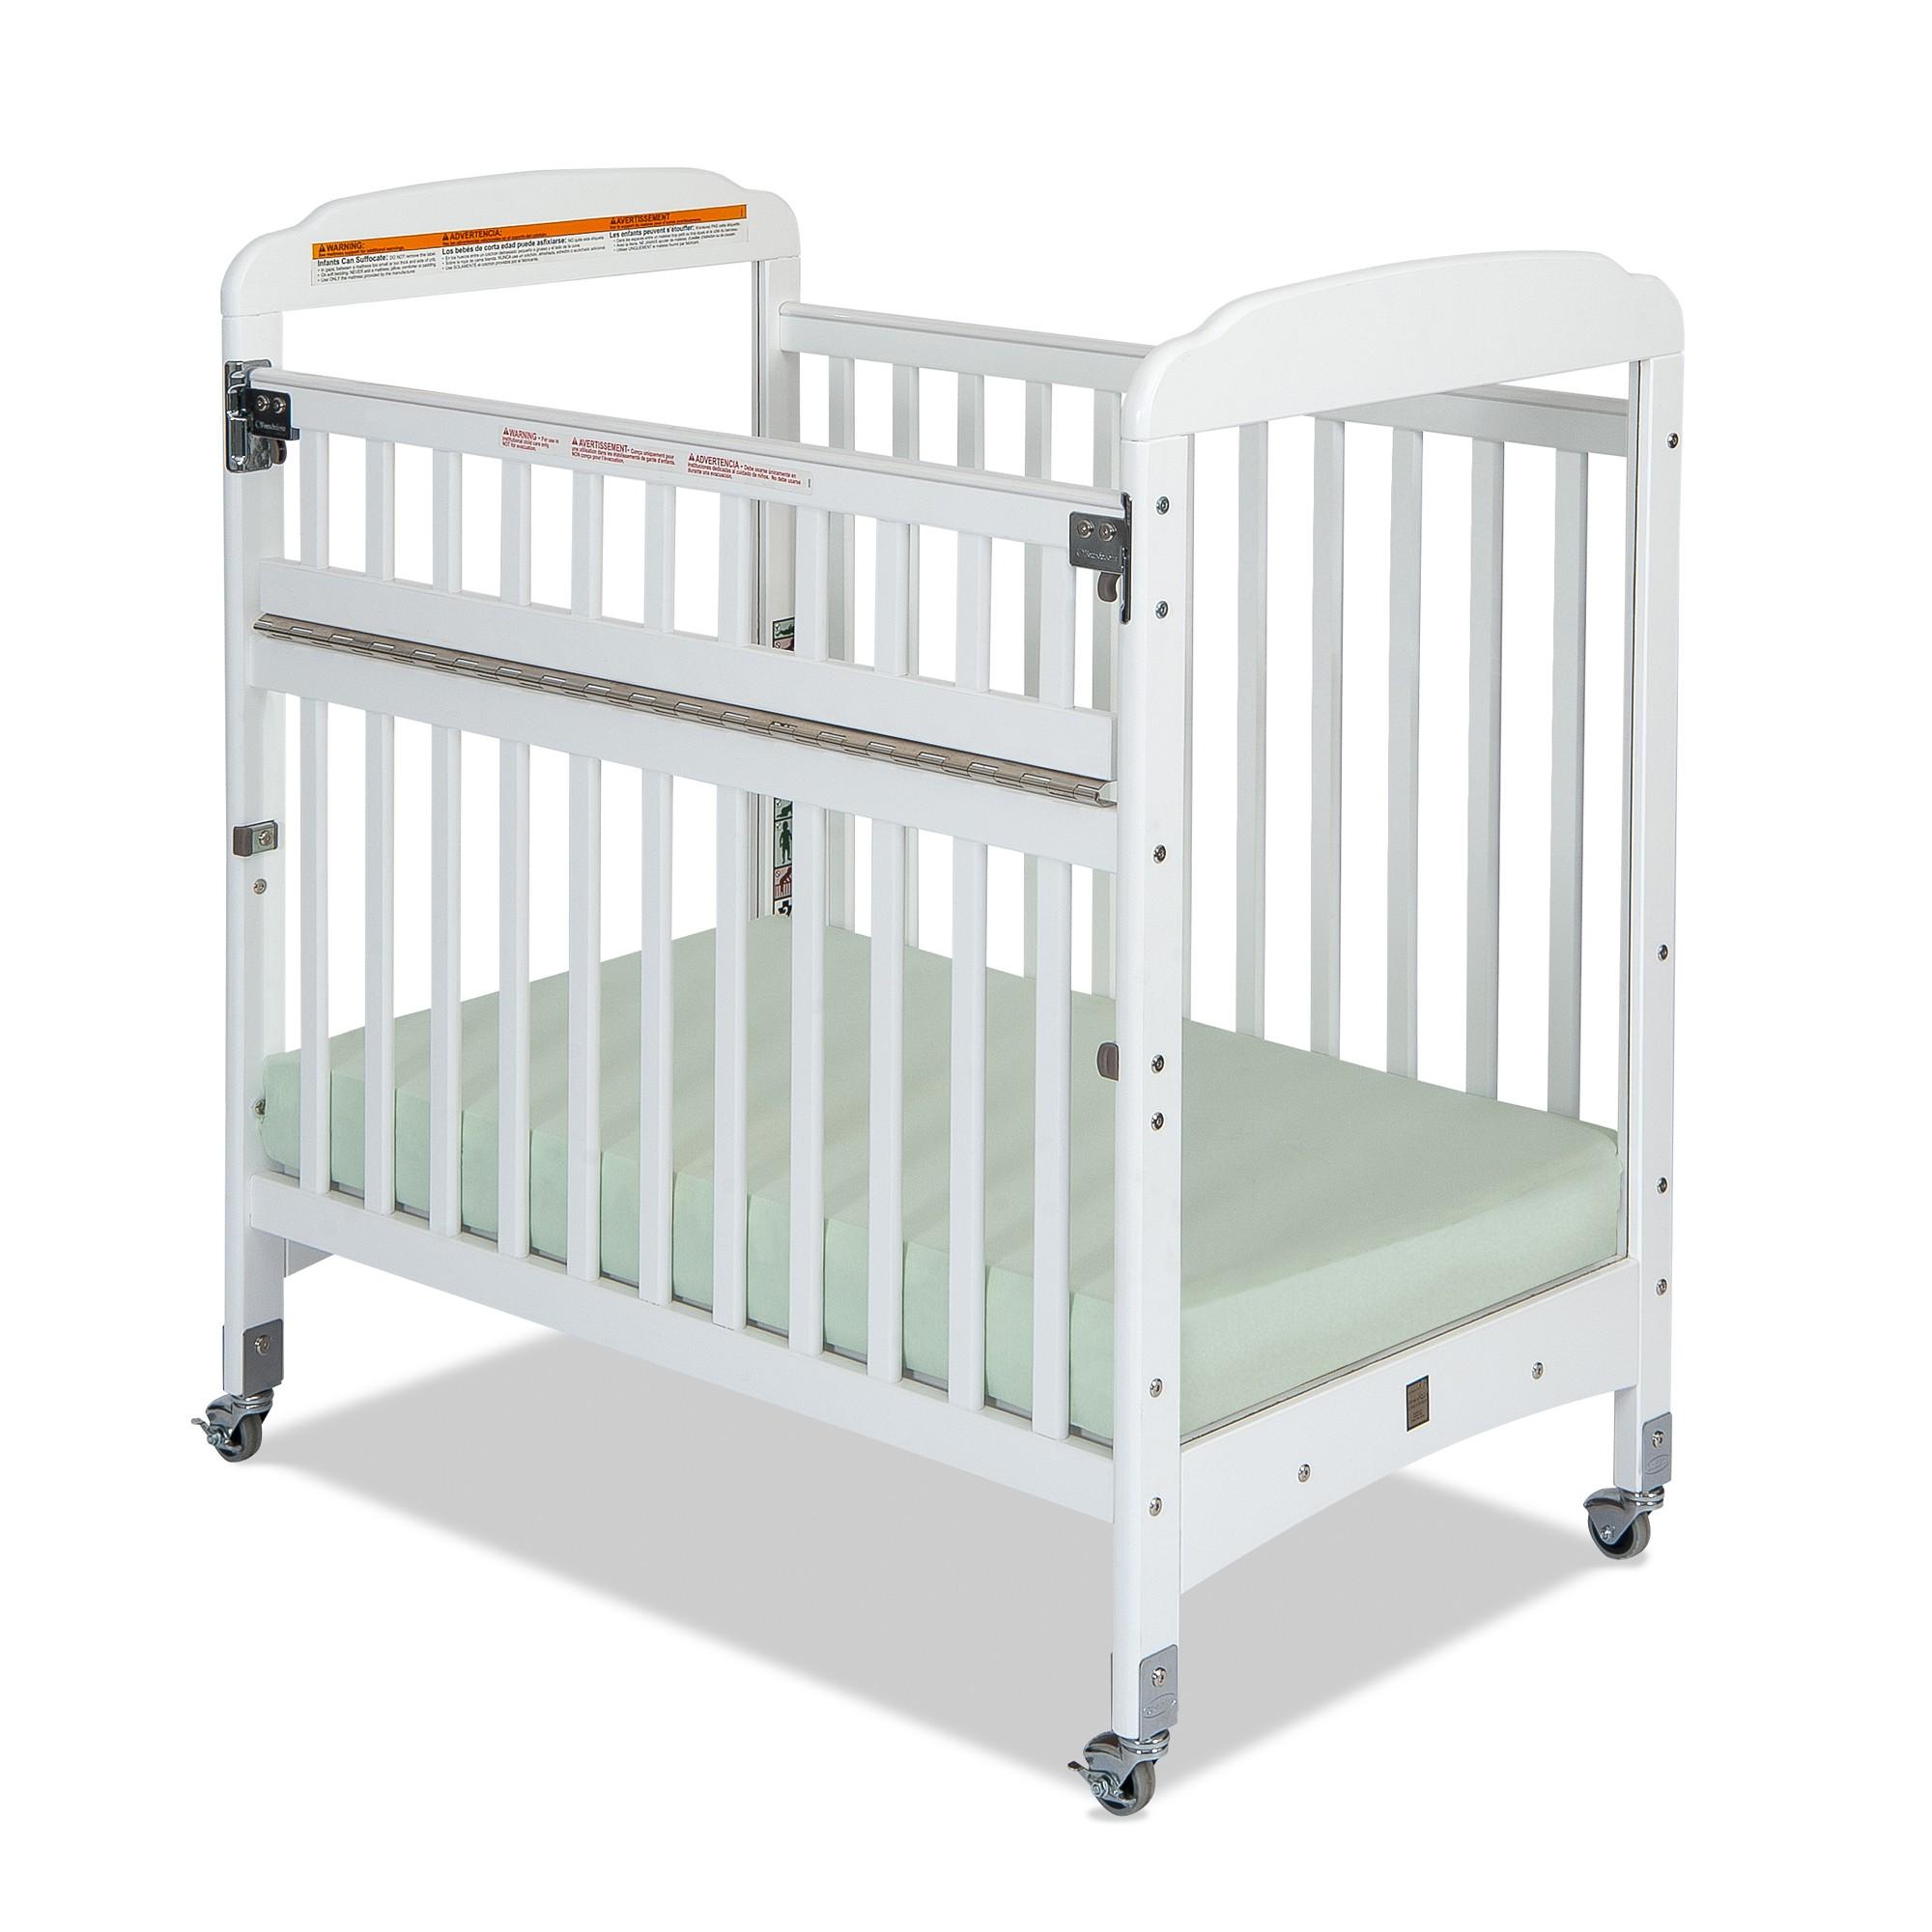 bella professional series child craft crib child craft. Black Bedroom Furniture Sets. Home Design Ideas